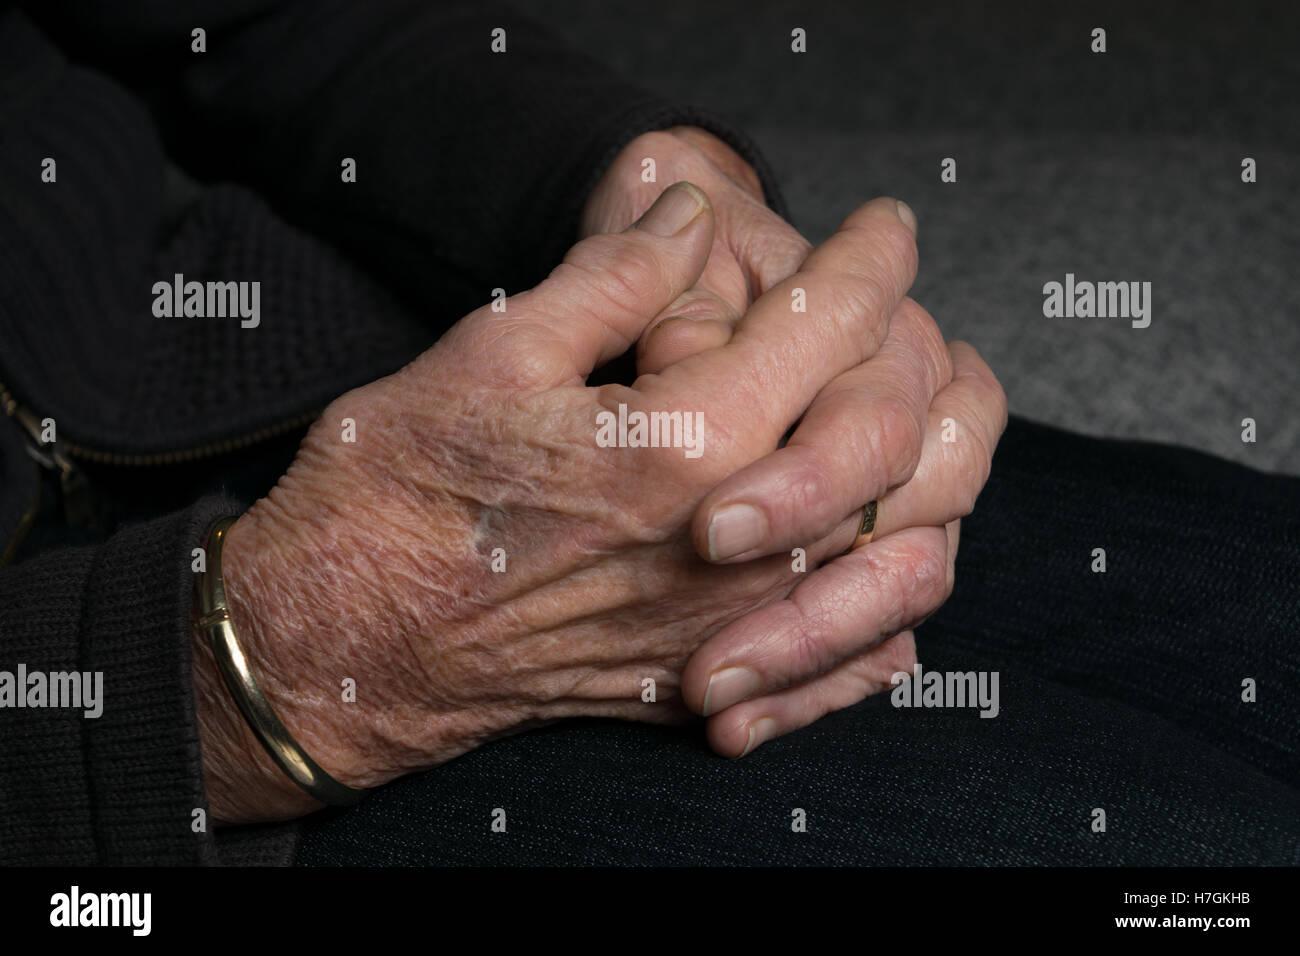 Old lady hands with arthritis aka osteoarthritis - Stock Image